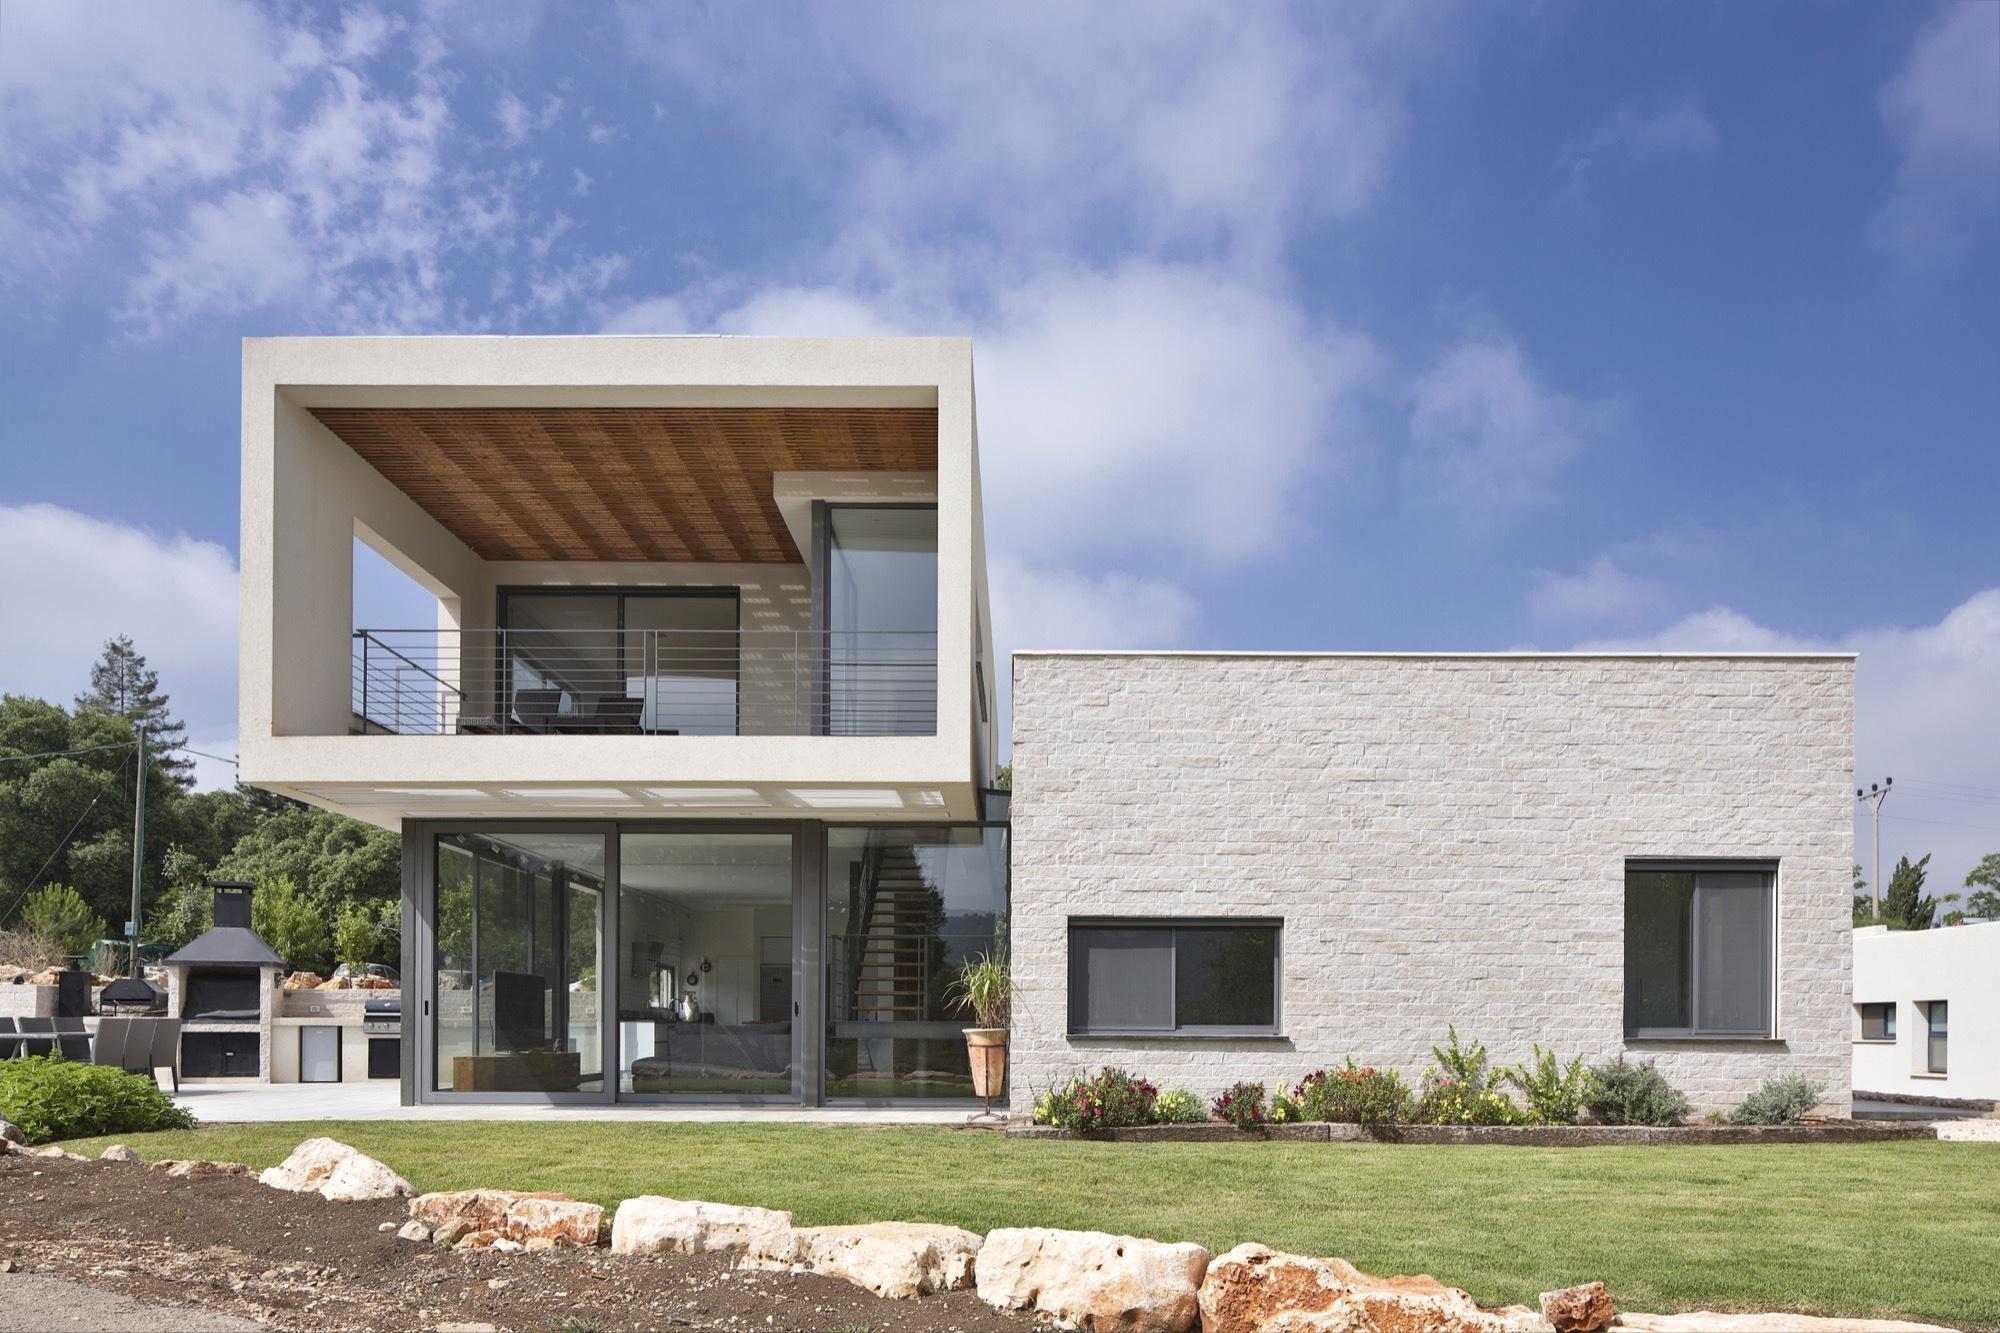 La casa de Golan y Ricky Rosenberg / SO Architecture